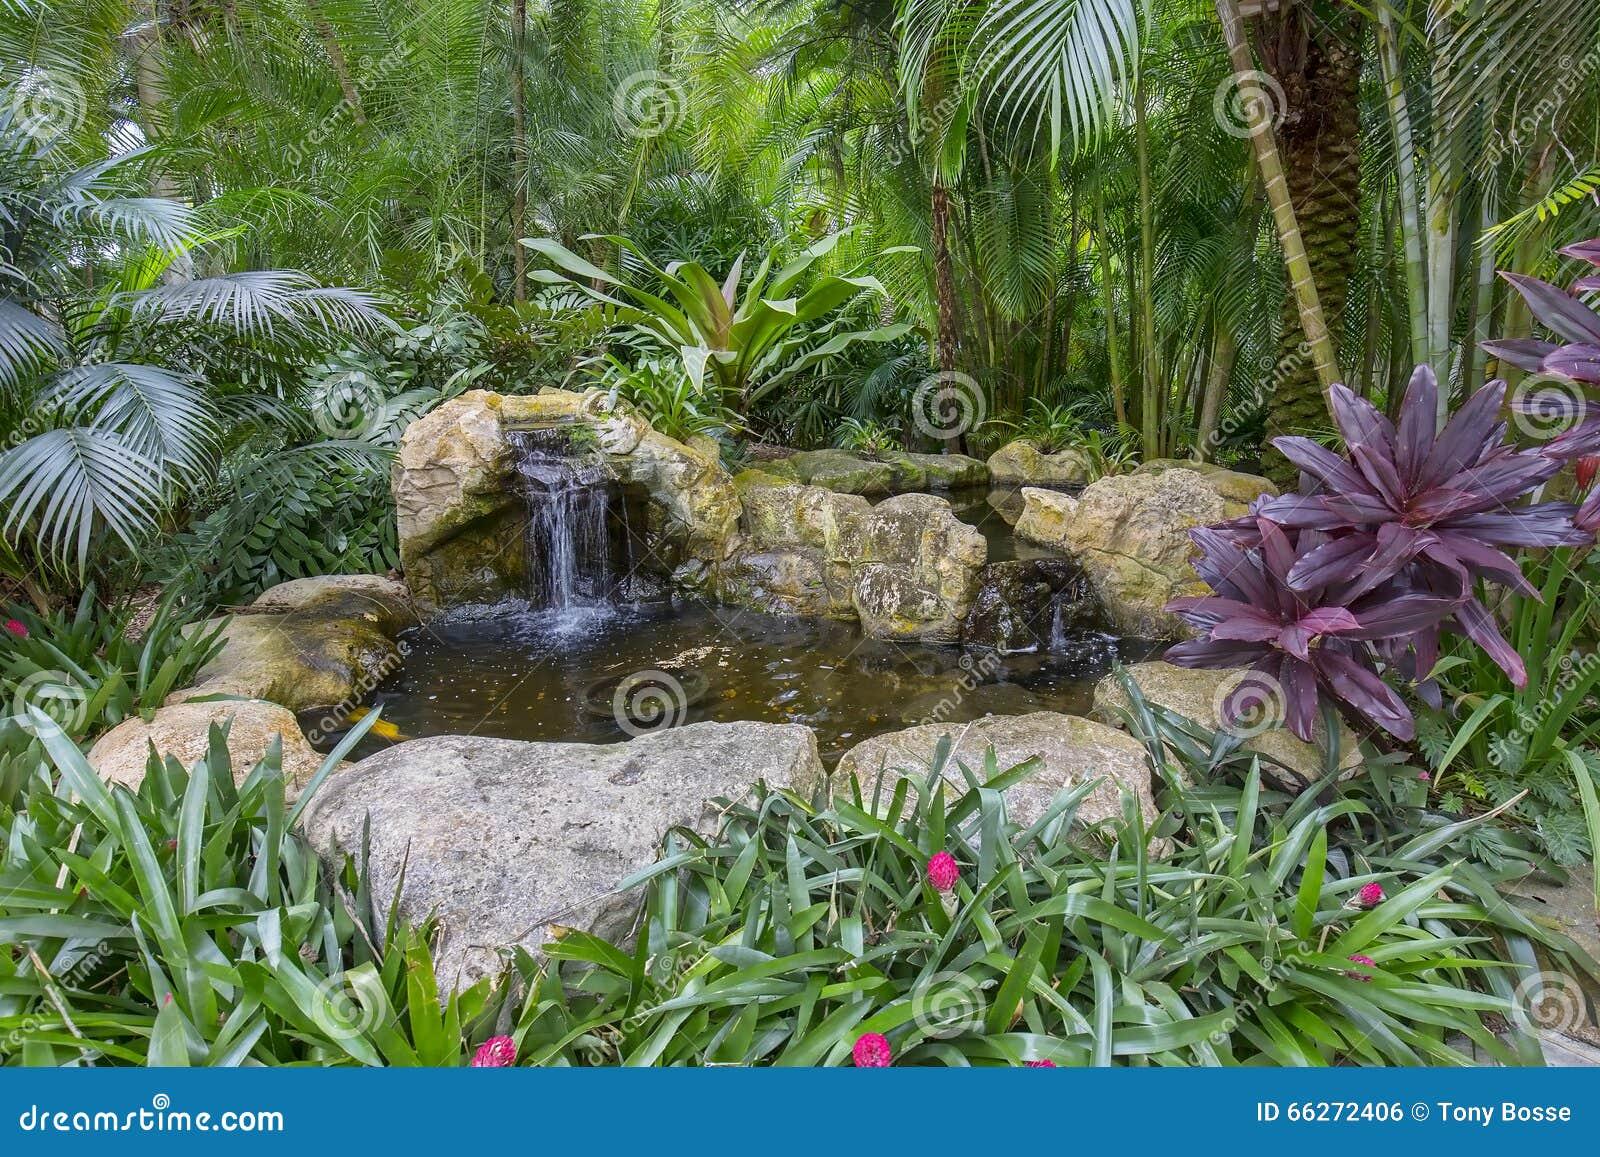 Am nagement de l 39 tang artificiel de jardin de roche photo for Amenagement etang de jardin